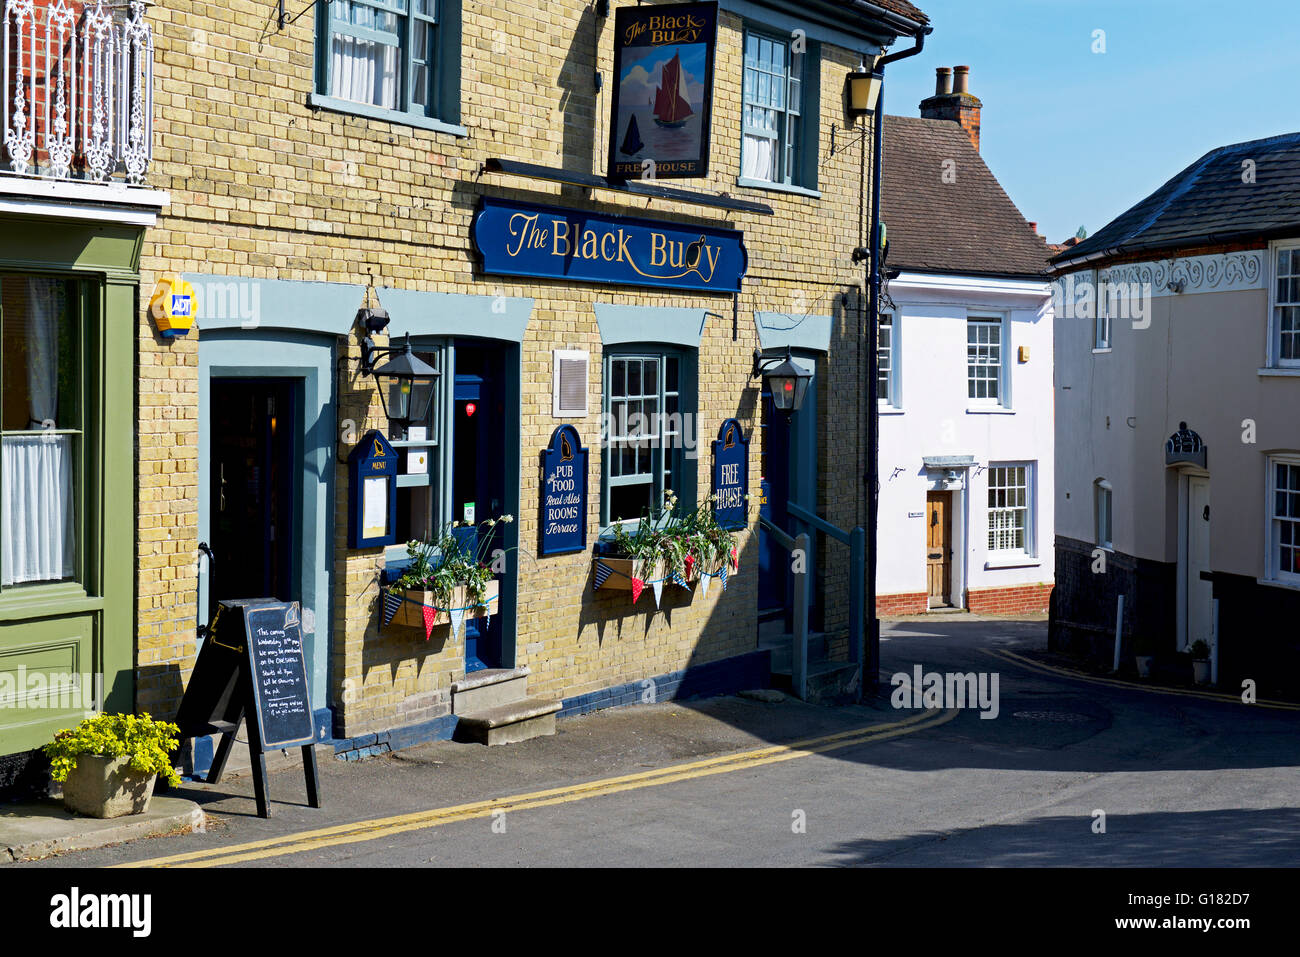 The Black Buoy pub in Wivenhoe, Essex, England UK - Stock Image